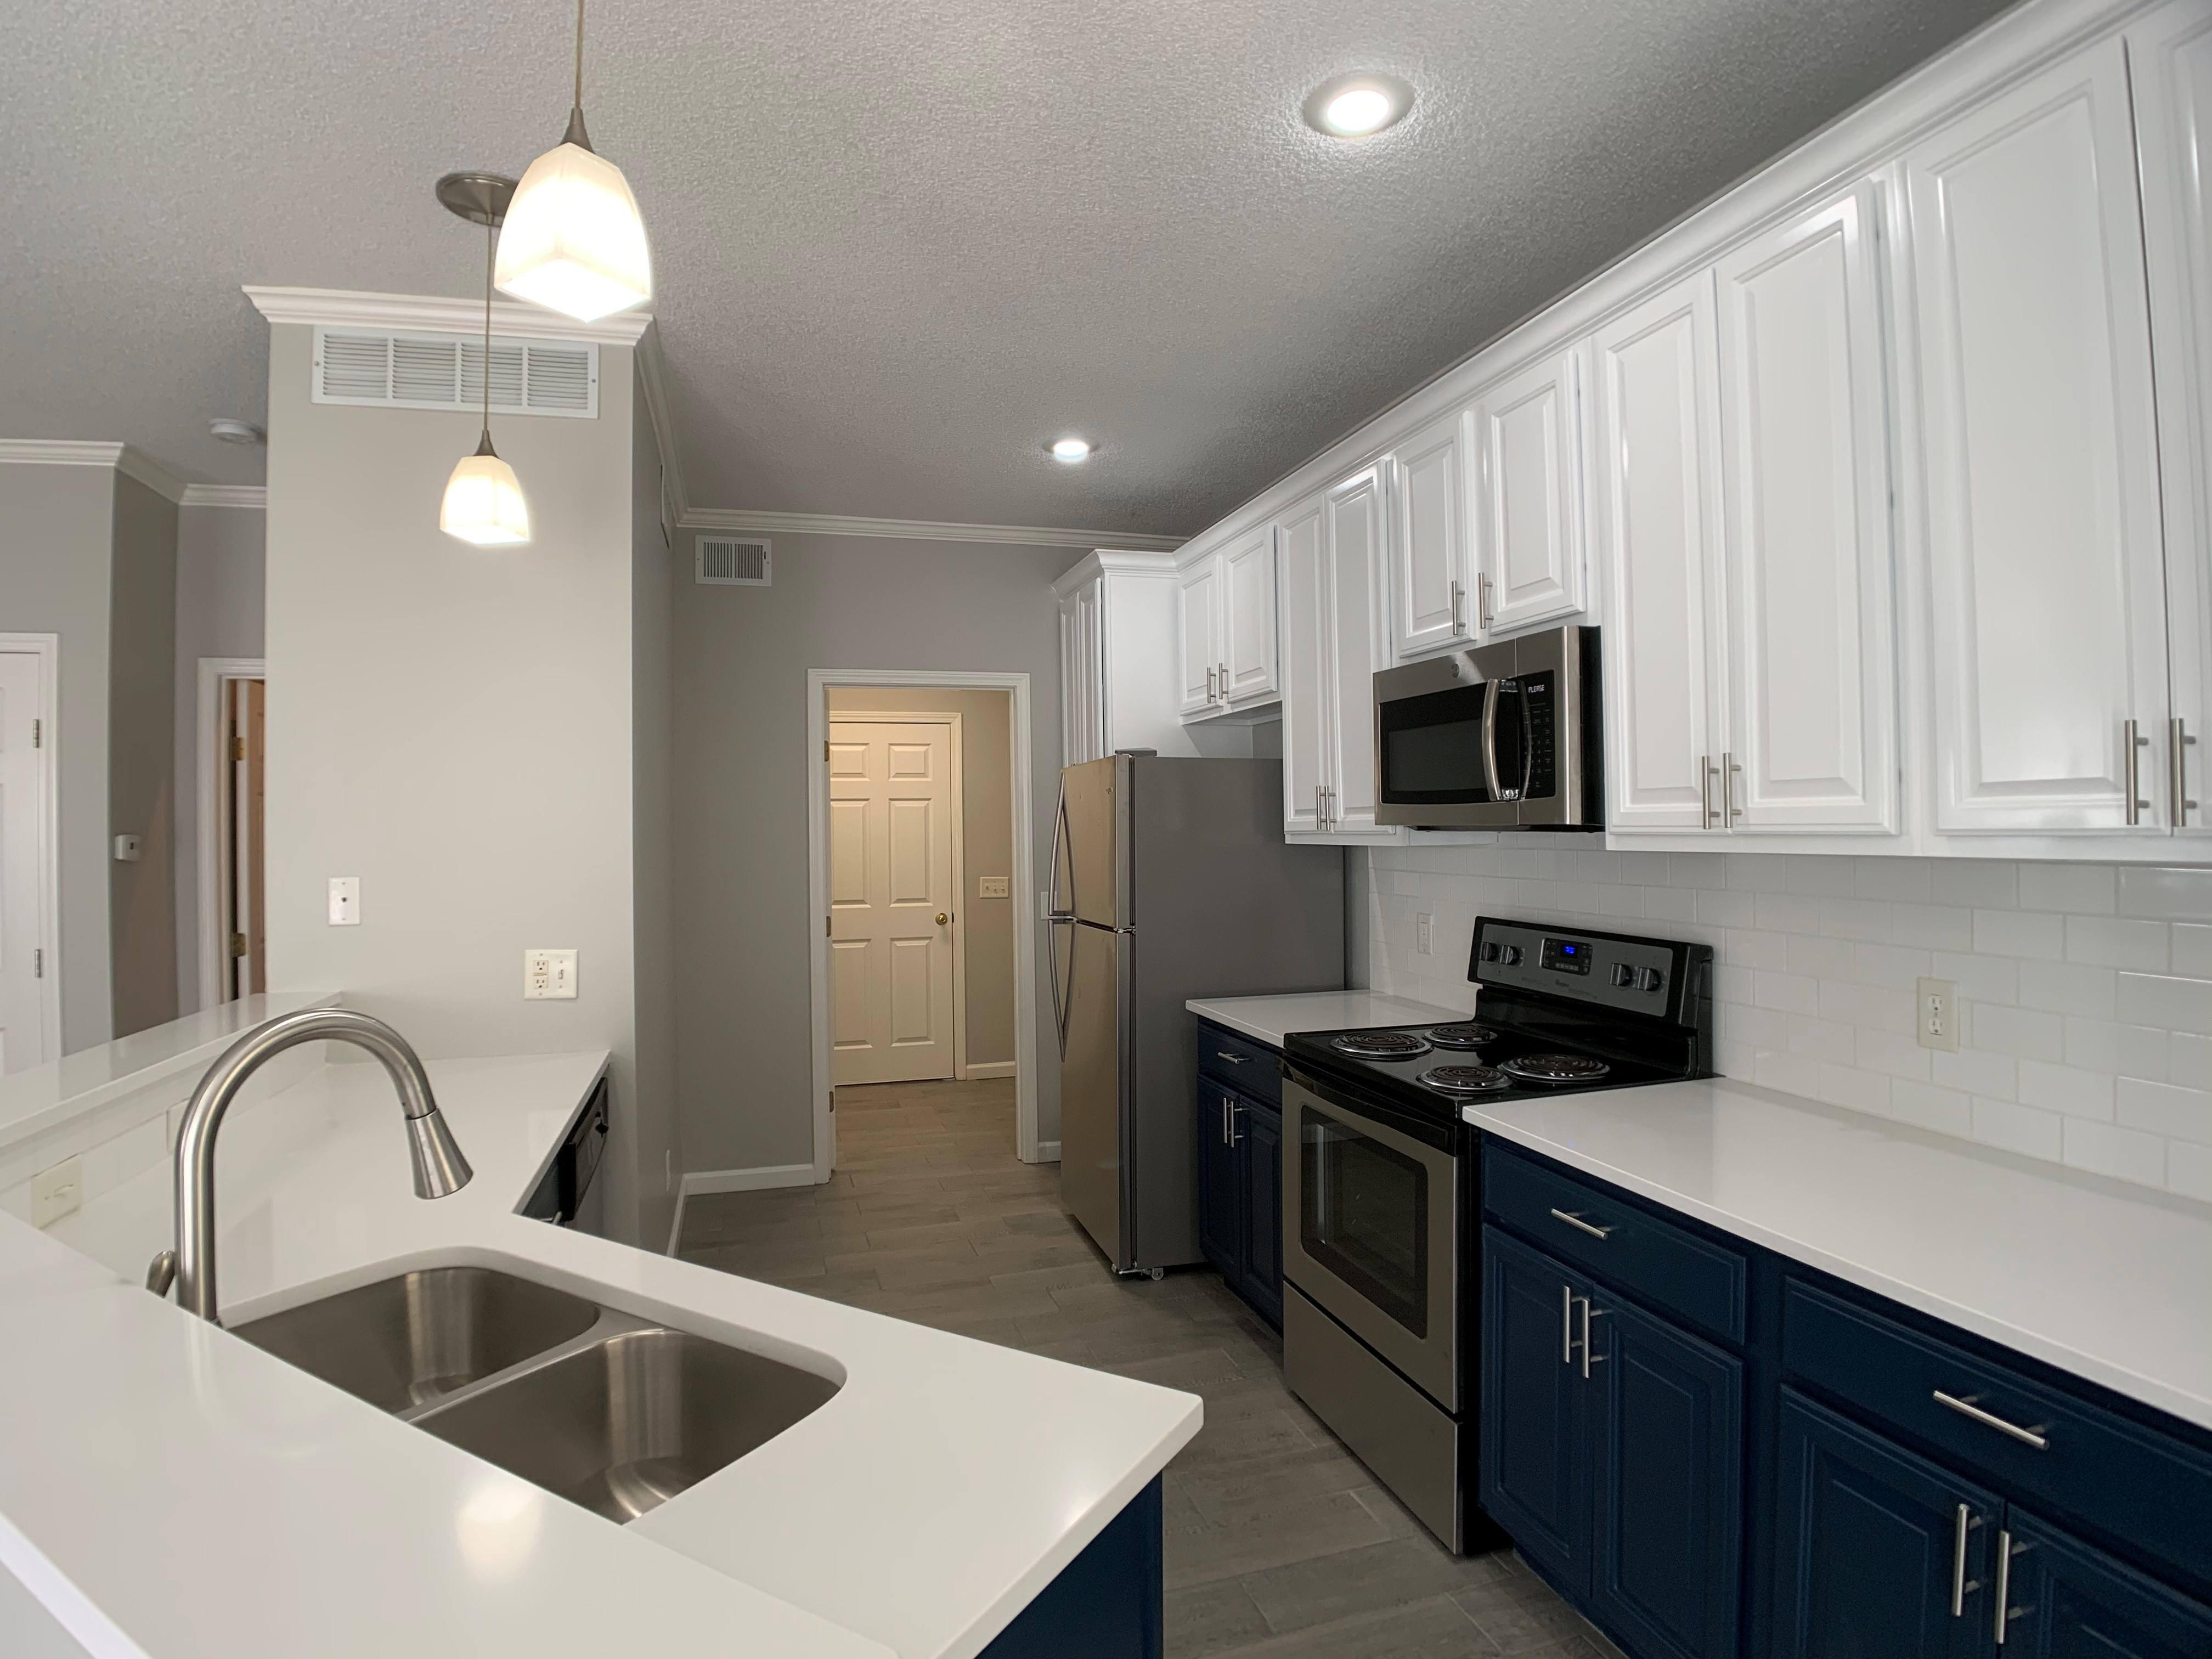 Apartments Near MNU Villas of Loiret Townhomes for MidAmerica Nazarene University Students in Olathe, KS